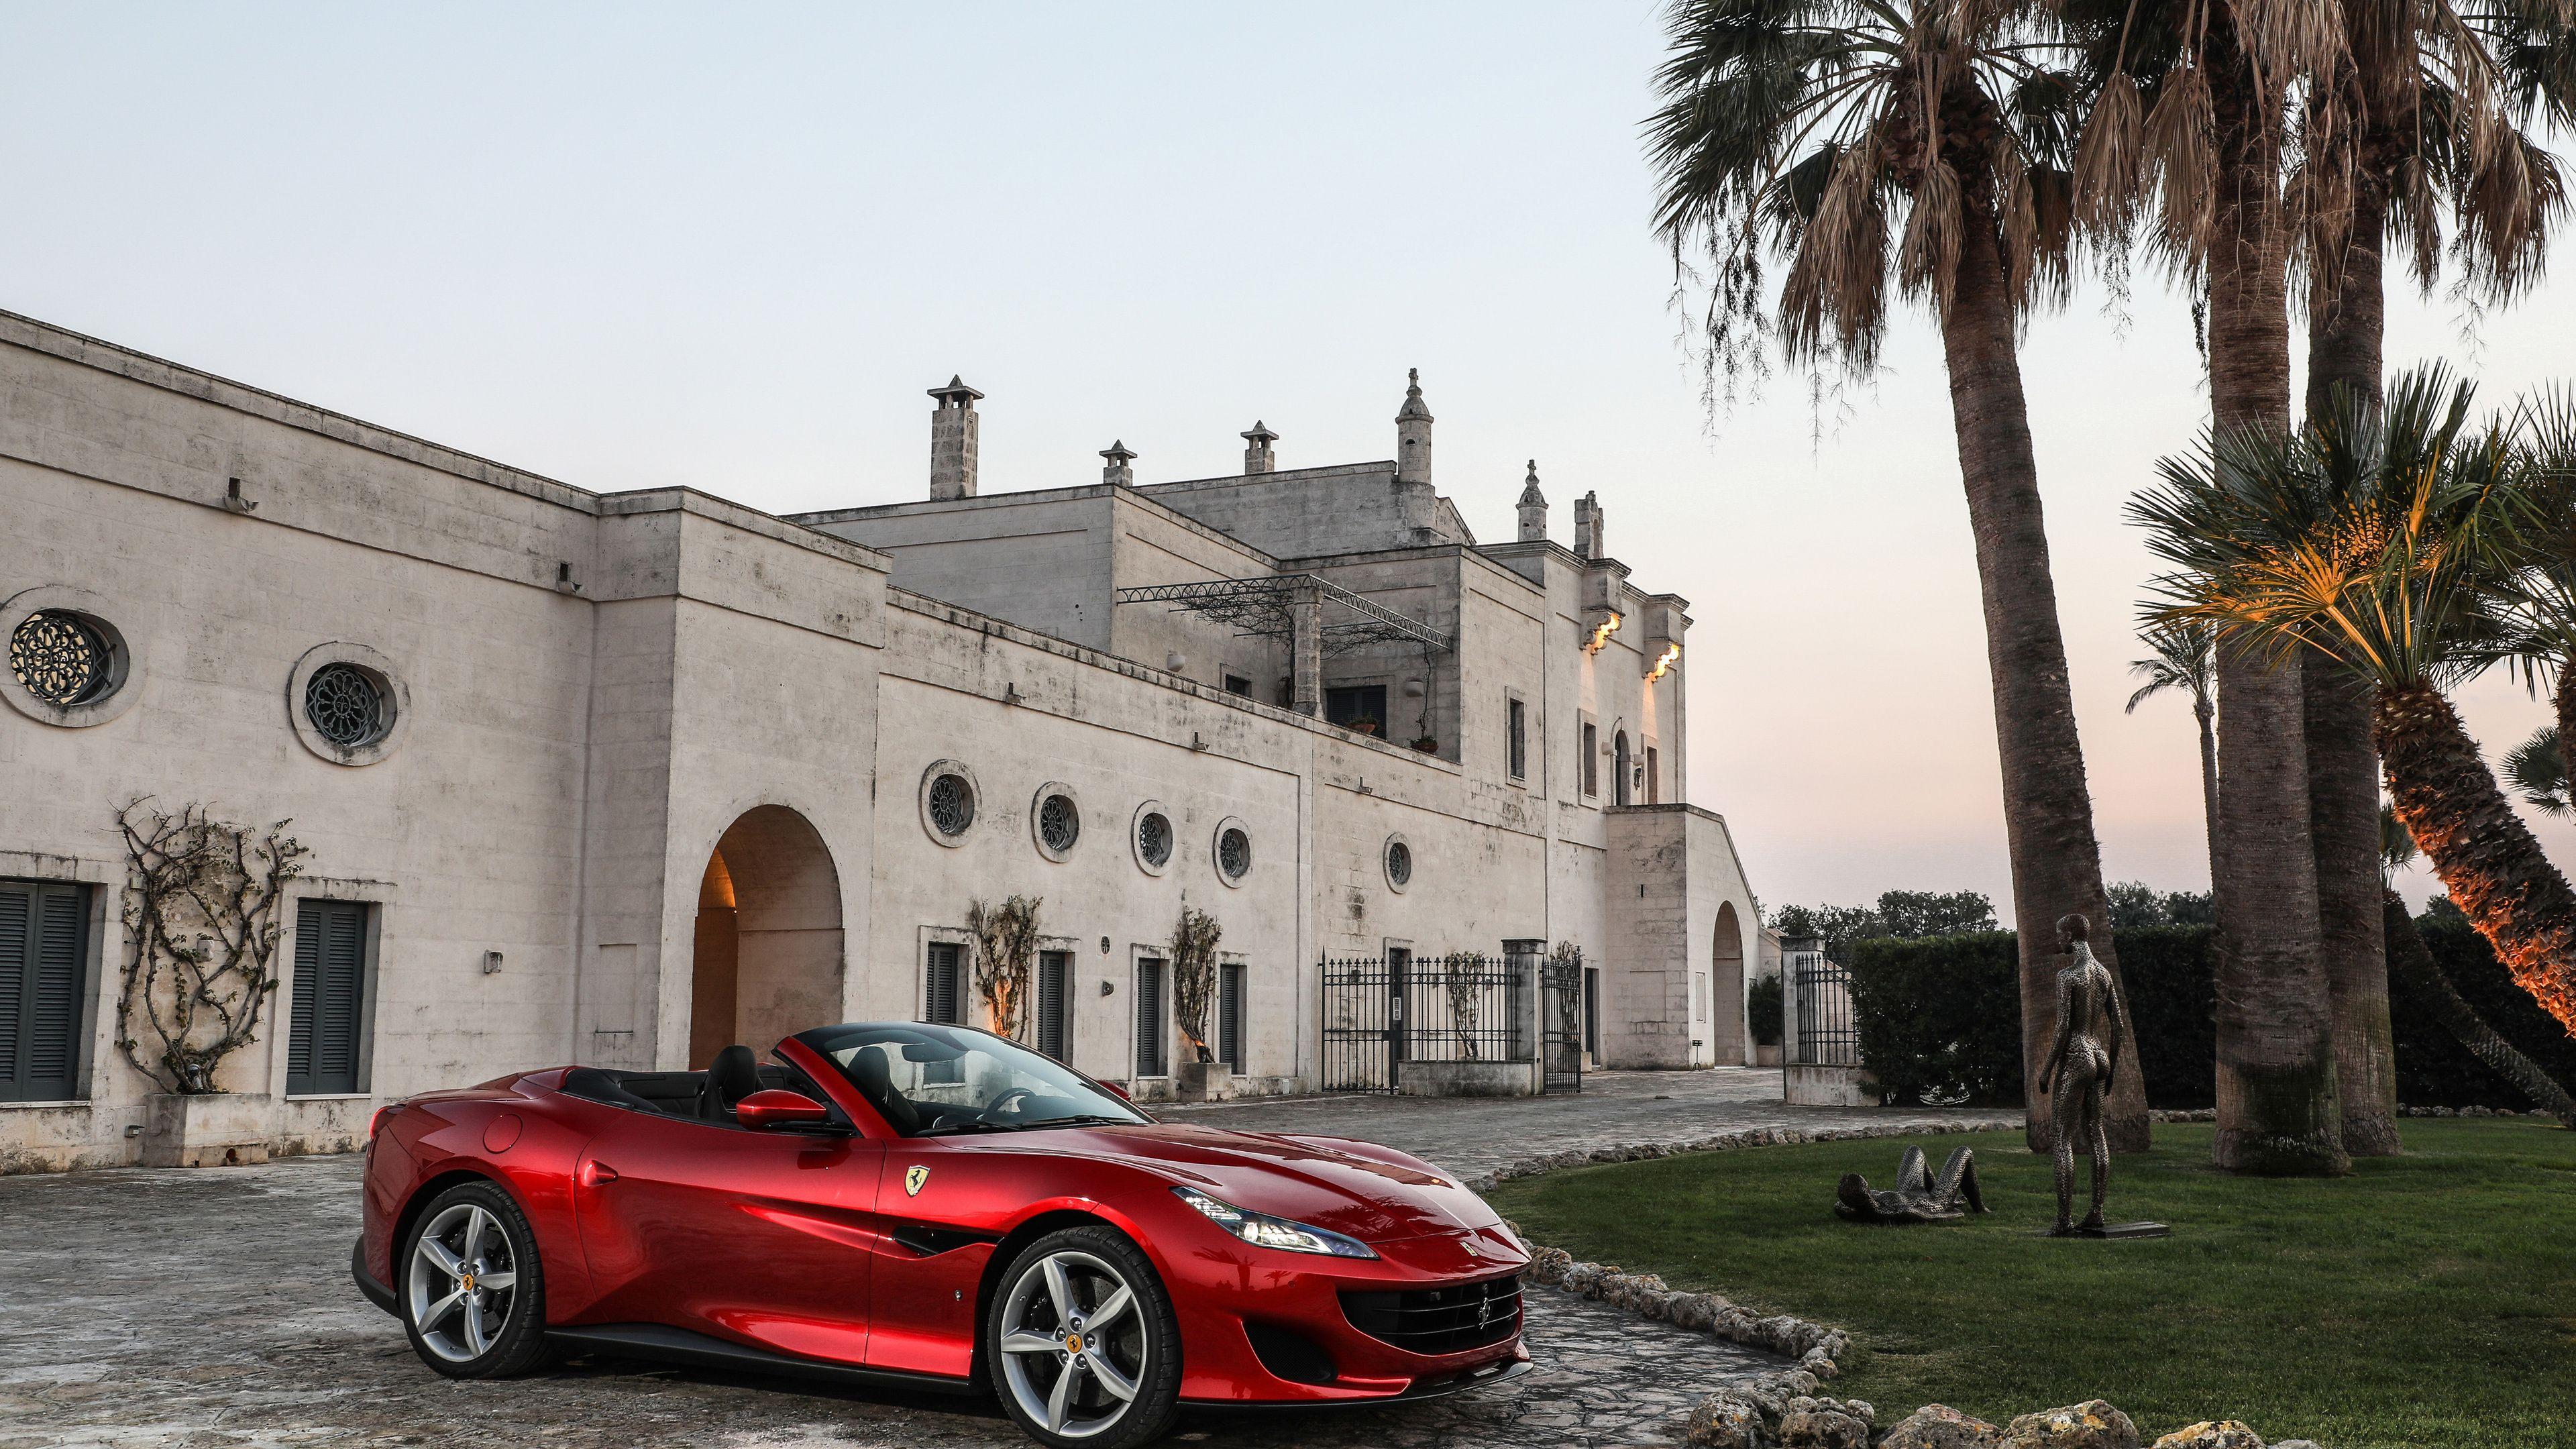 Ferrari Portofino 2018 4k Hd Wallpapers Ferrari Wallpapers Ferrari